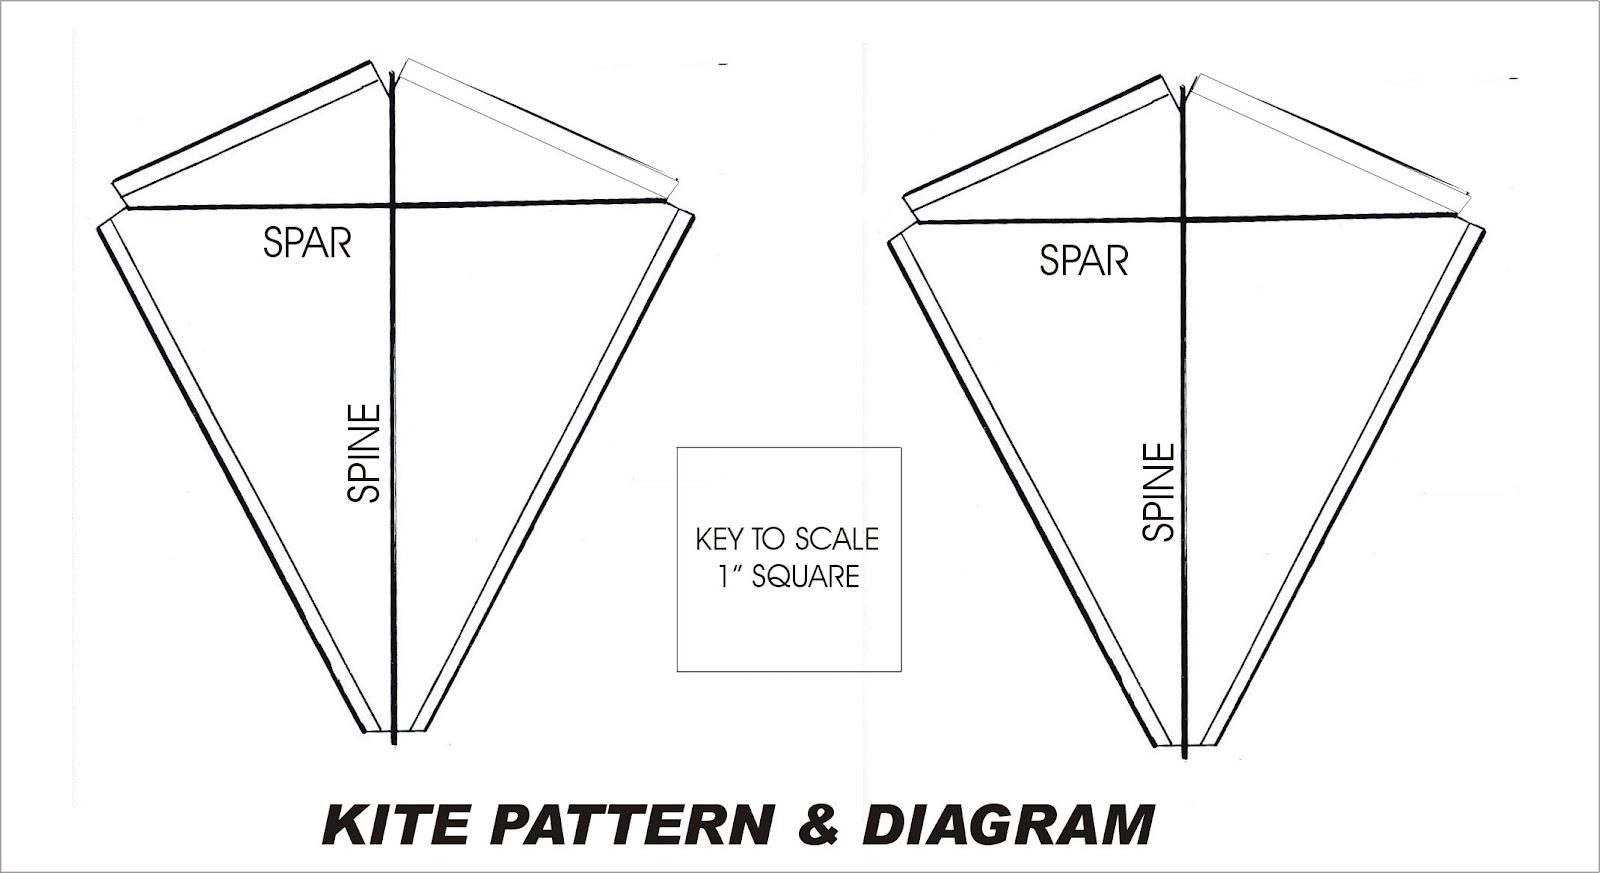 printable kite template search results calendar 2015. Black Bedroom Furniture Sets. Home Design Ideas